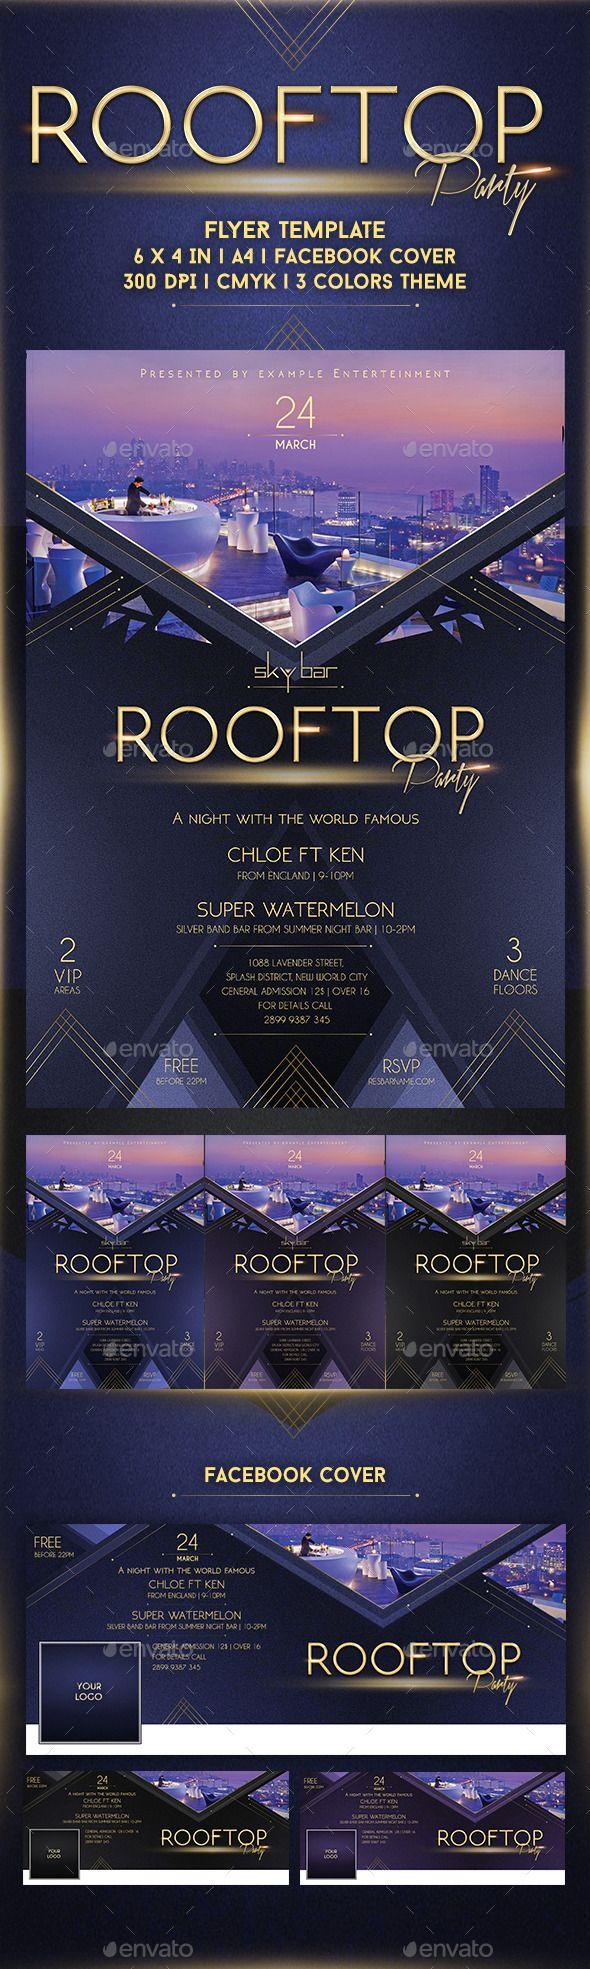 rooftop party flyer template cs 6x4 bar black blue celebration